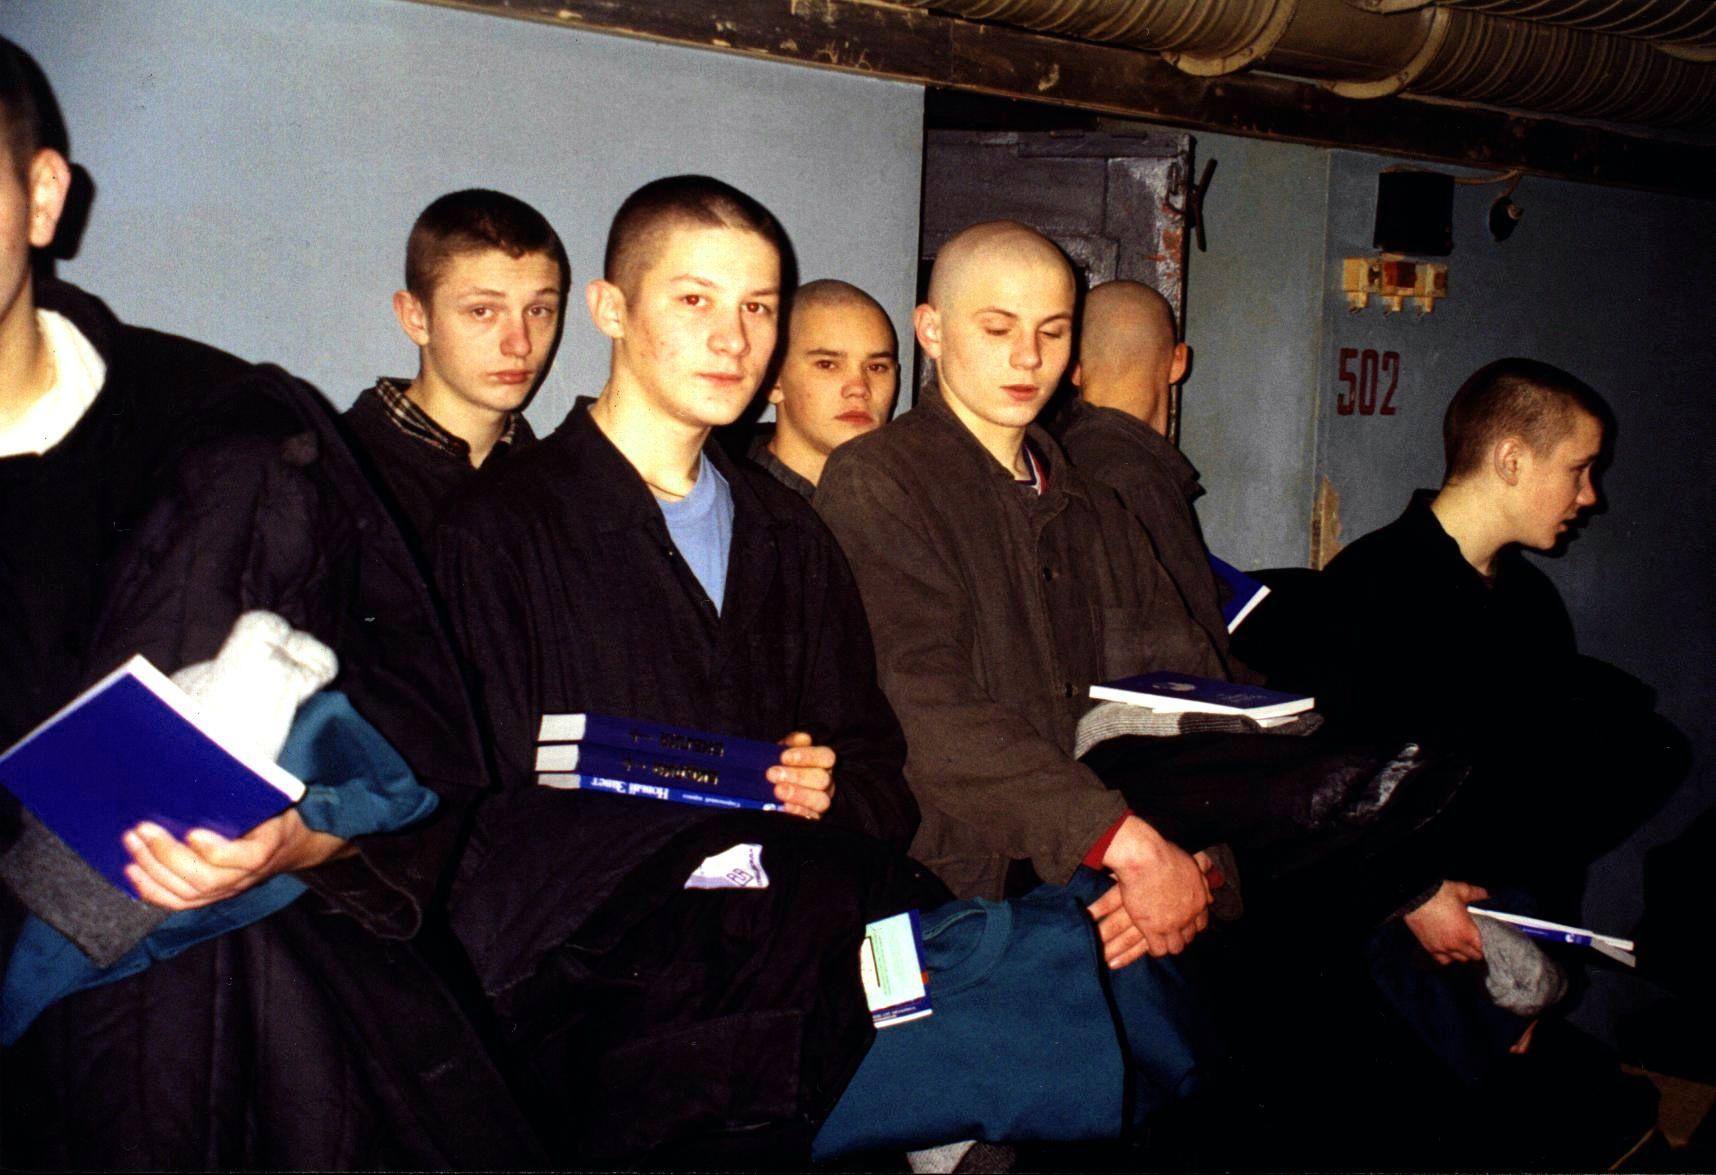 Teens-at-5-2 МОБО Духовная Свобода, Москва, Россия